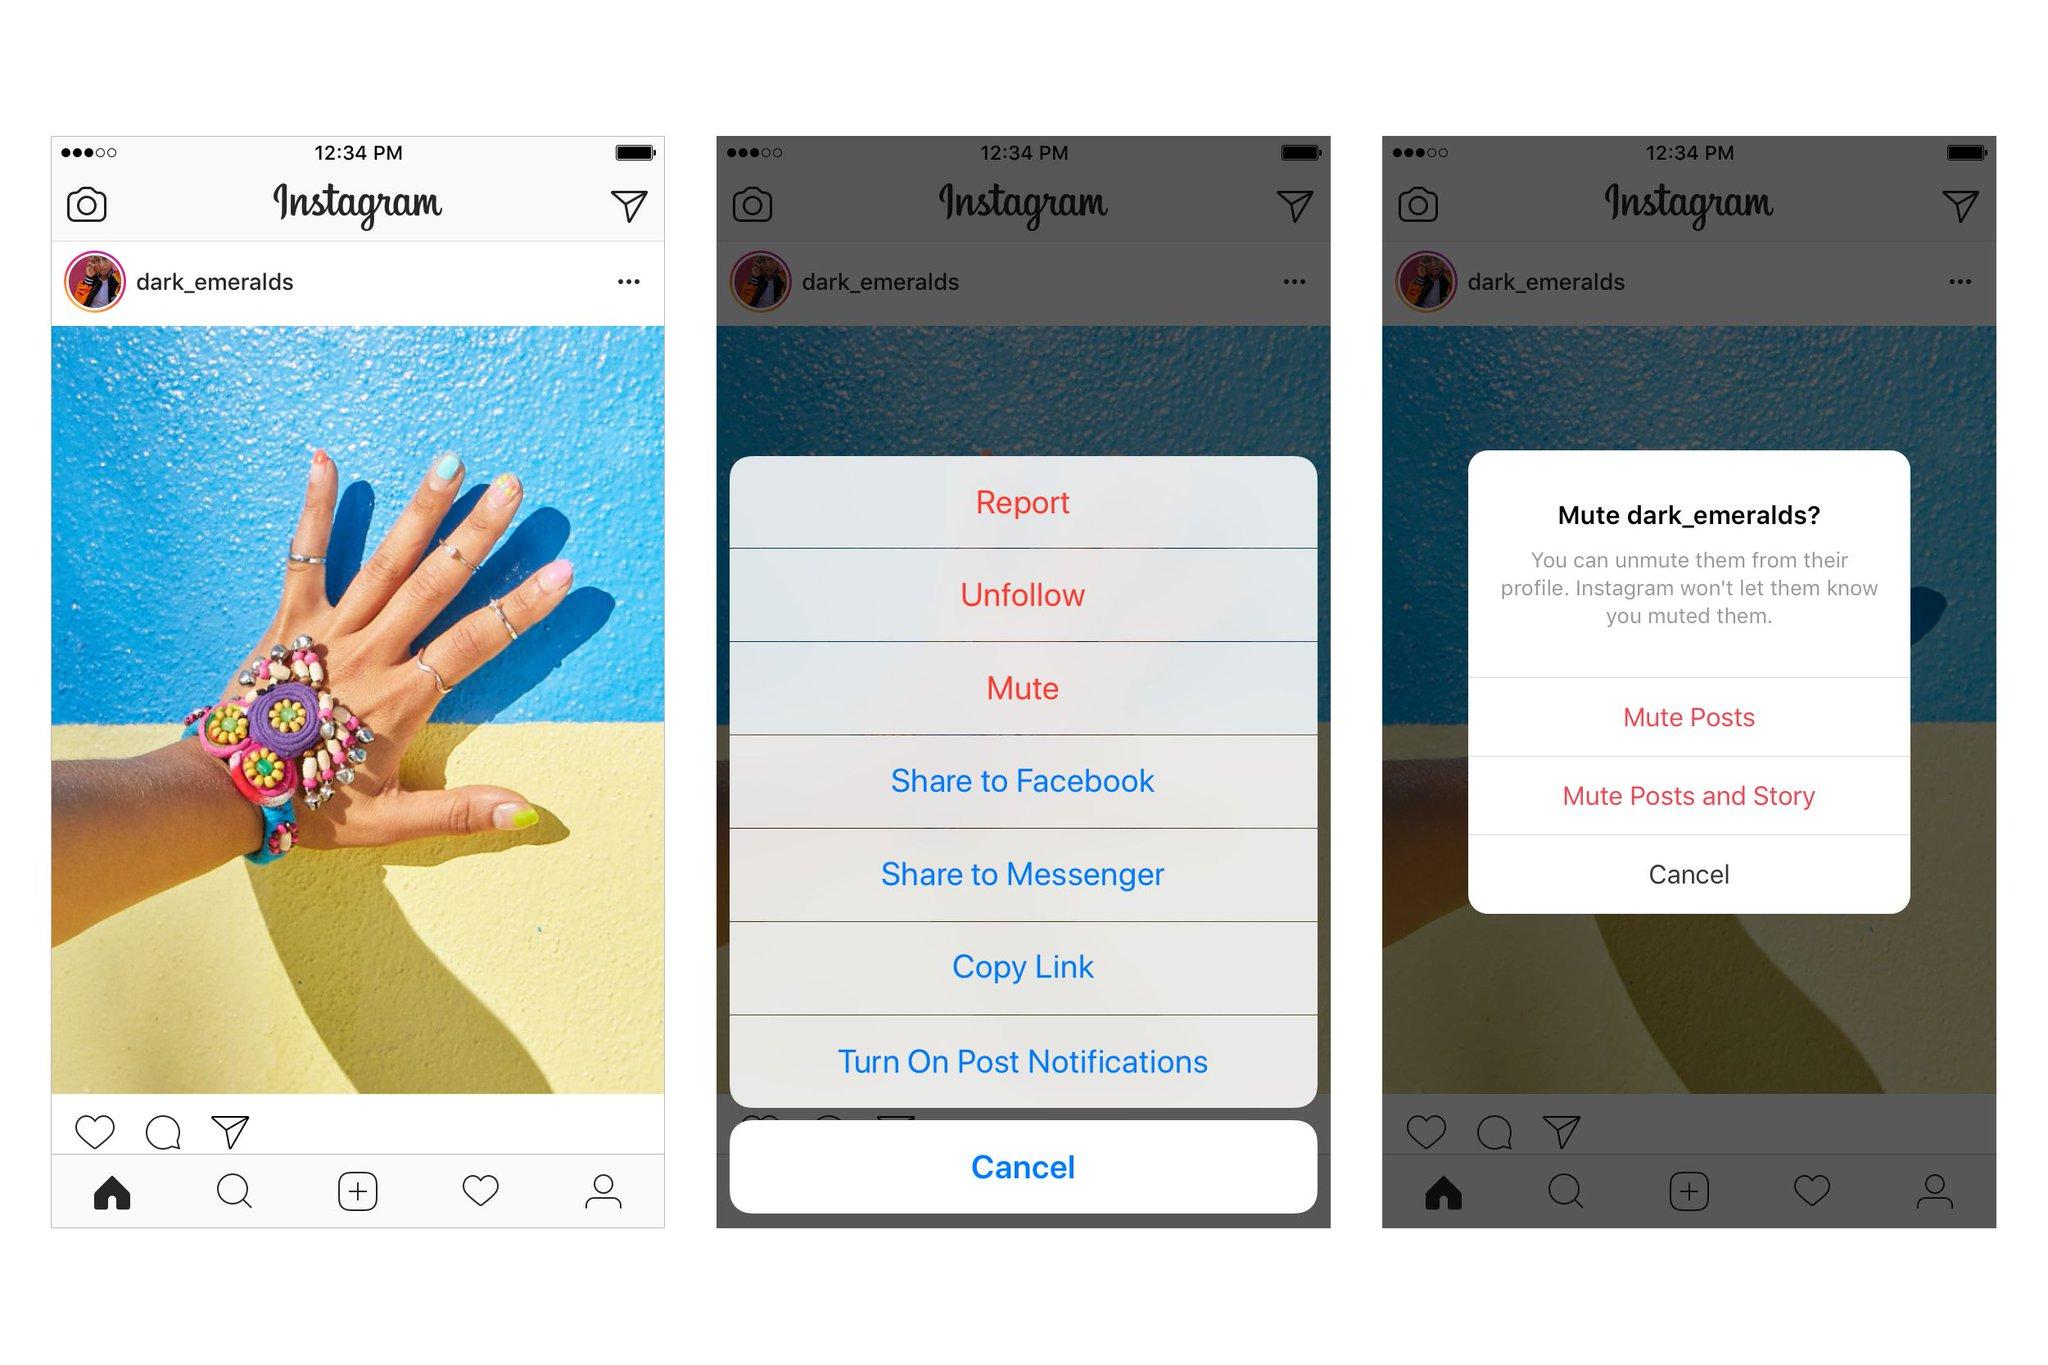 Instagram now lets you mute your friends https://t.co/eJ5pUEszVU https://t.co/aDbRFuaJ5P